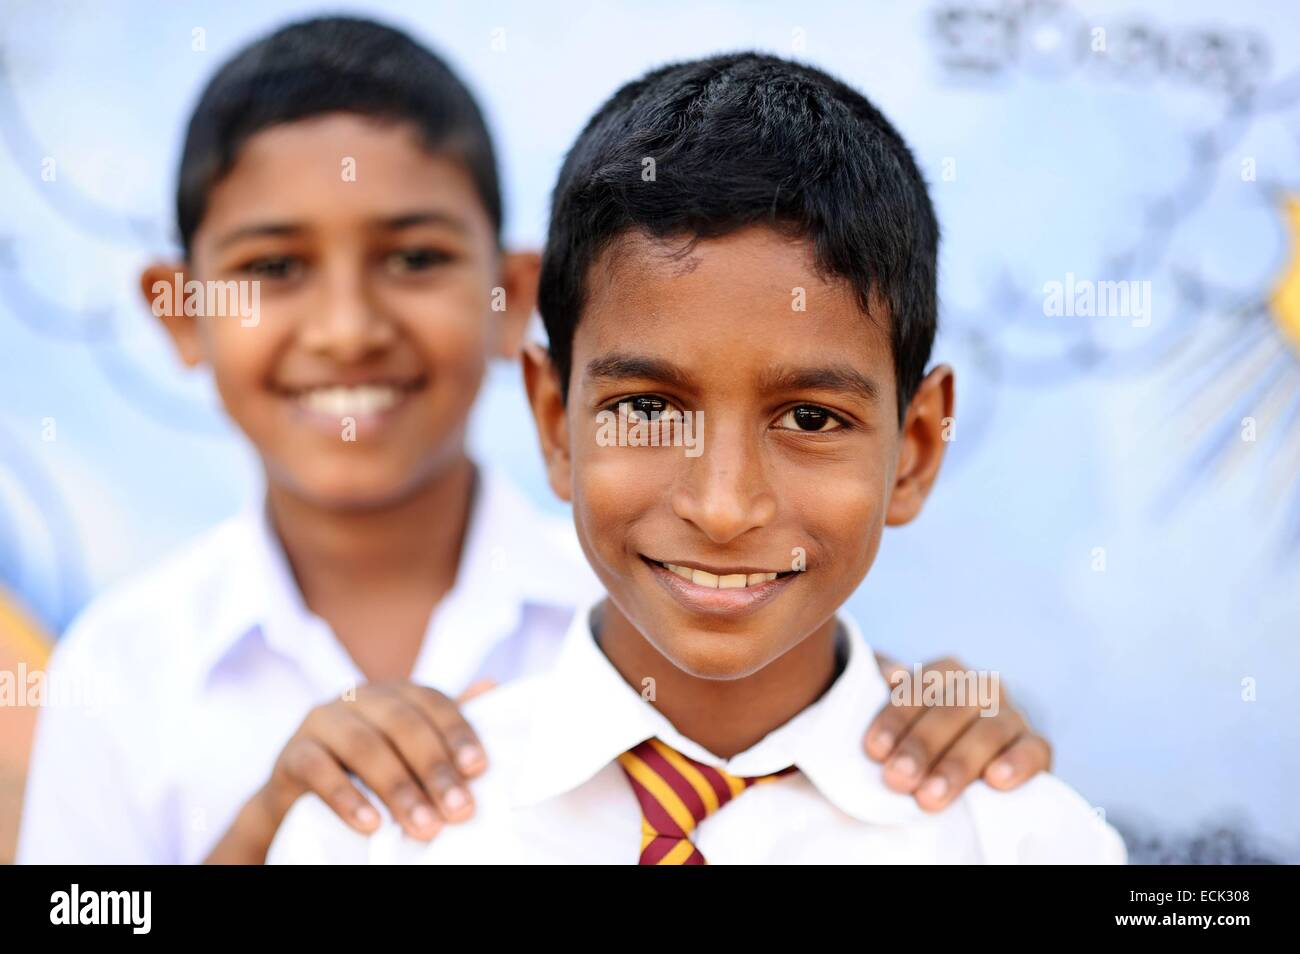 Sri Lanka, Colombo, portrait of 2 smiling schoolboys - Stock Image